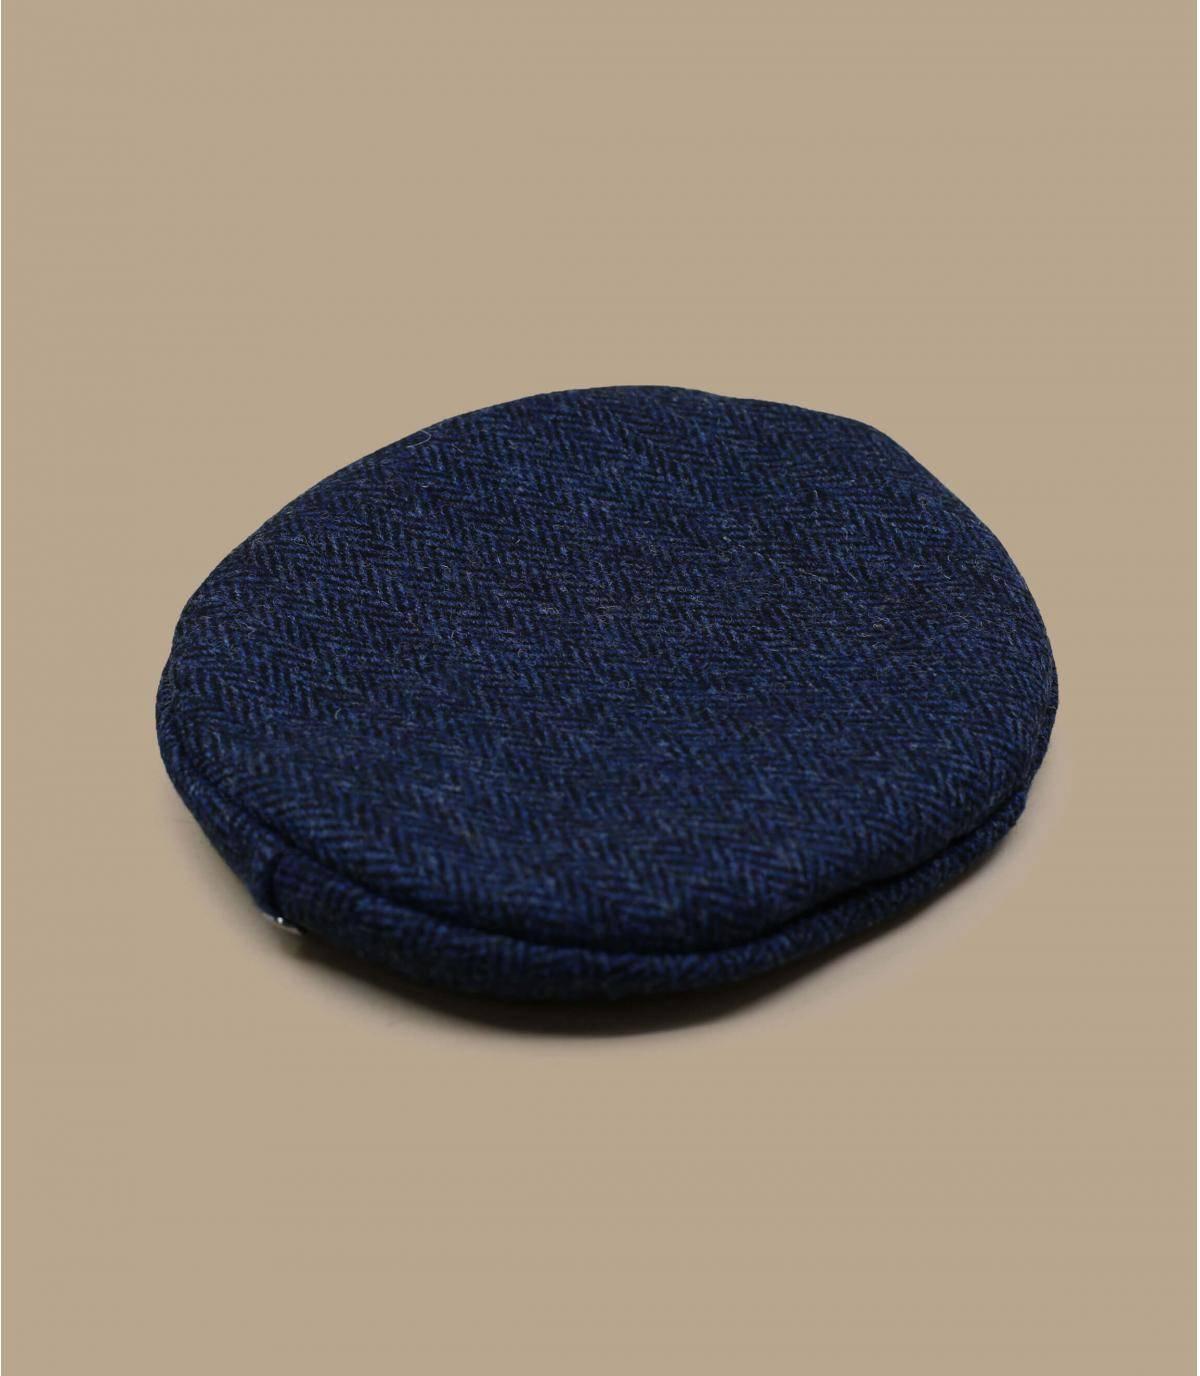 béret tweed bleu